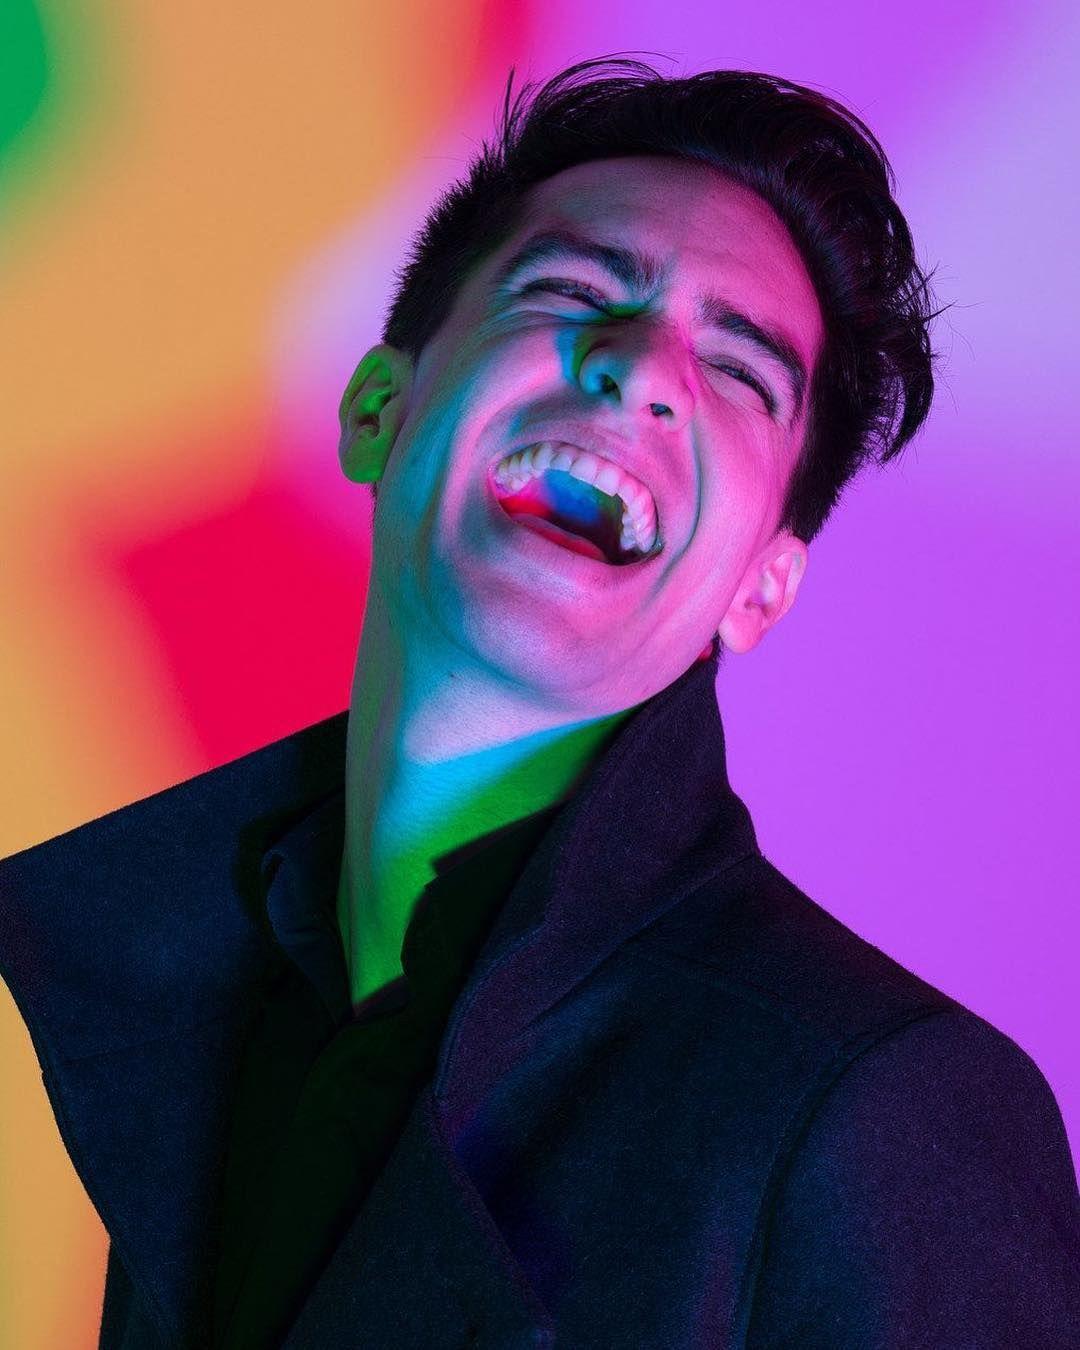 [New] The 10 Best Home Decor (with Pictures) -  Hes so precious #twentyonepilots #trench #tylerjoseph #joshdun #yellow #panicatthedisco #brendonurie #beebo #red #orange #yellow #green #blue #purple #pink #rose #panic #beautiful #love #live #life #sing #singing #singer #prayforthewicked #music #idol #loveislove